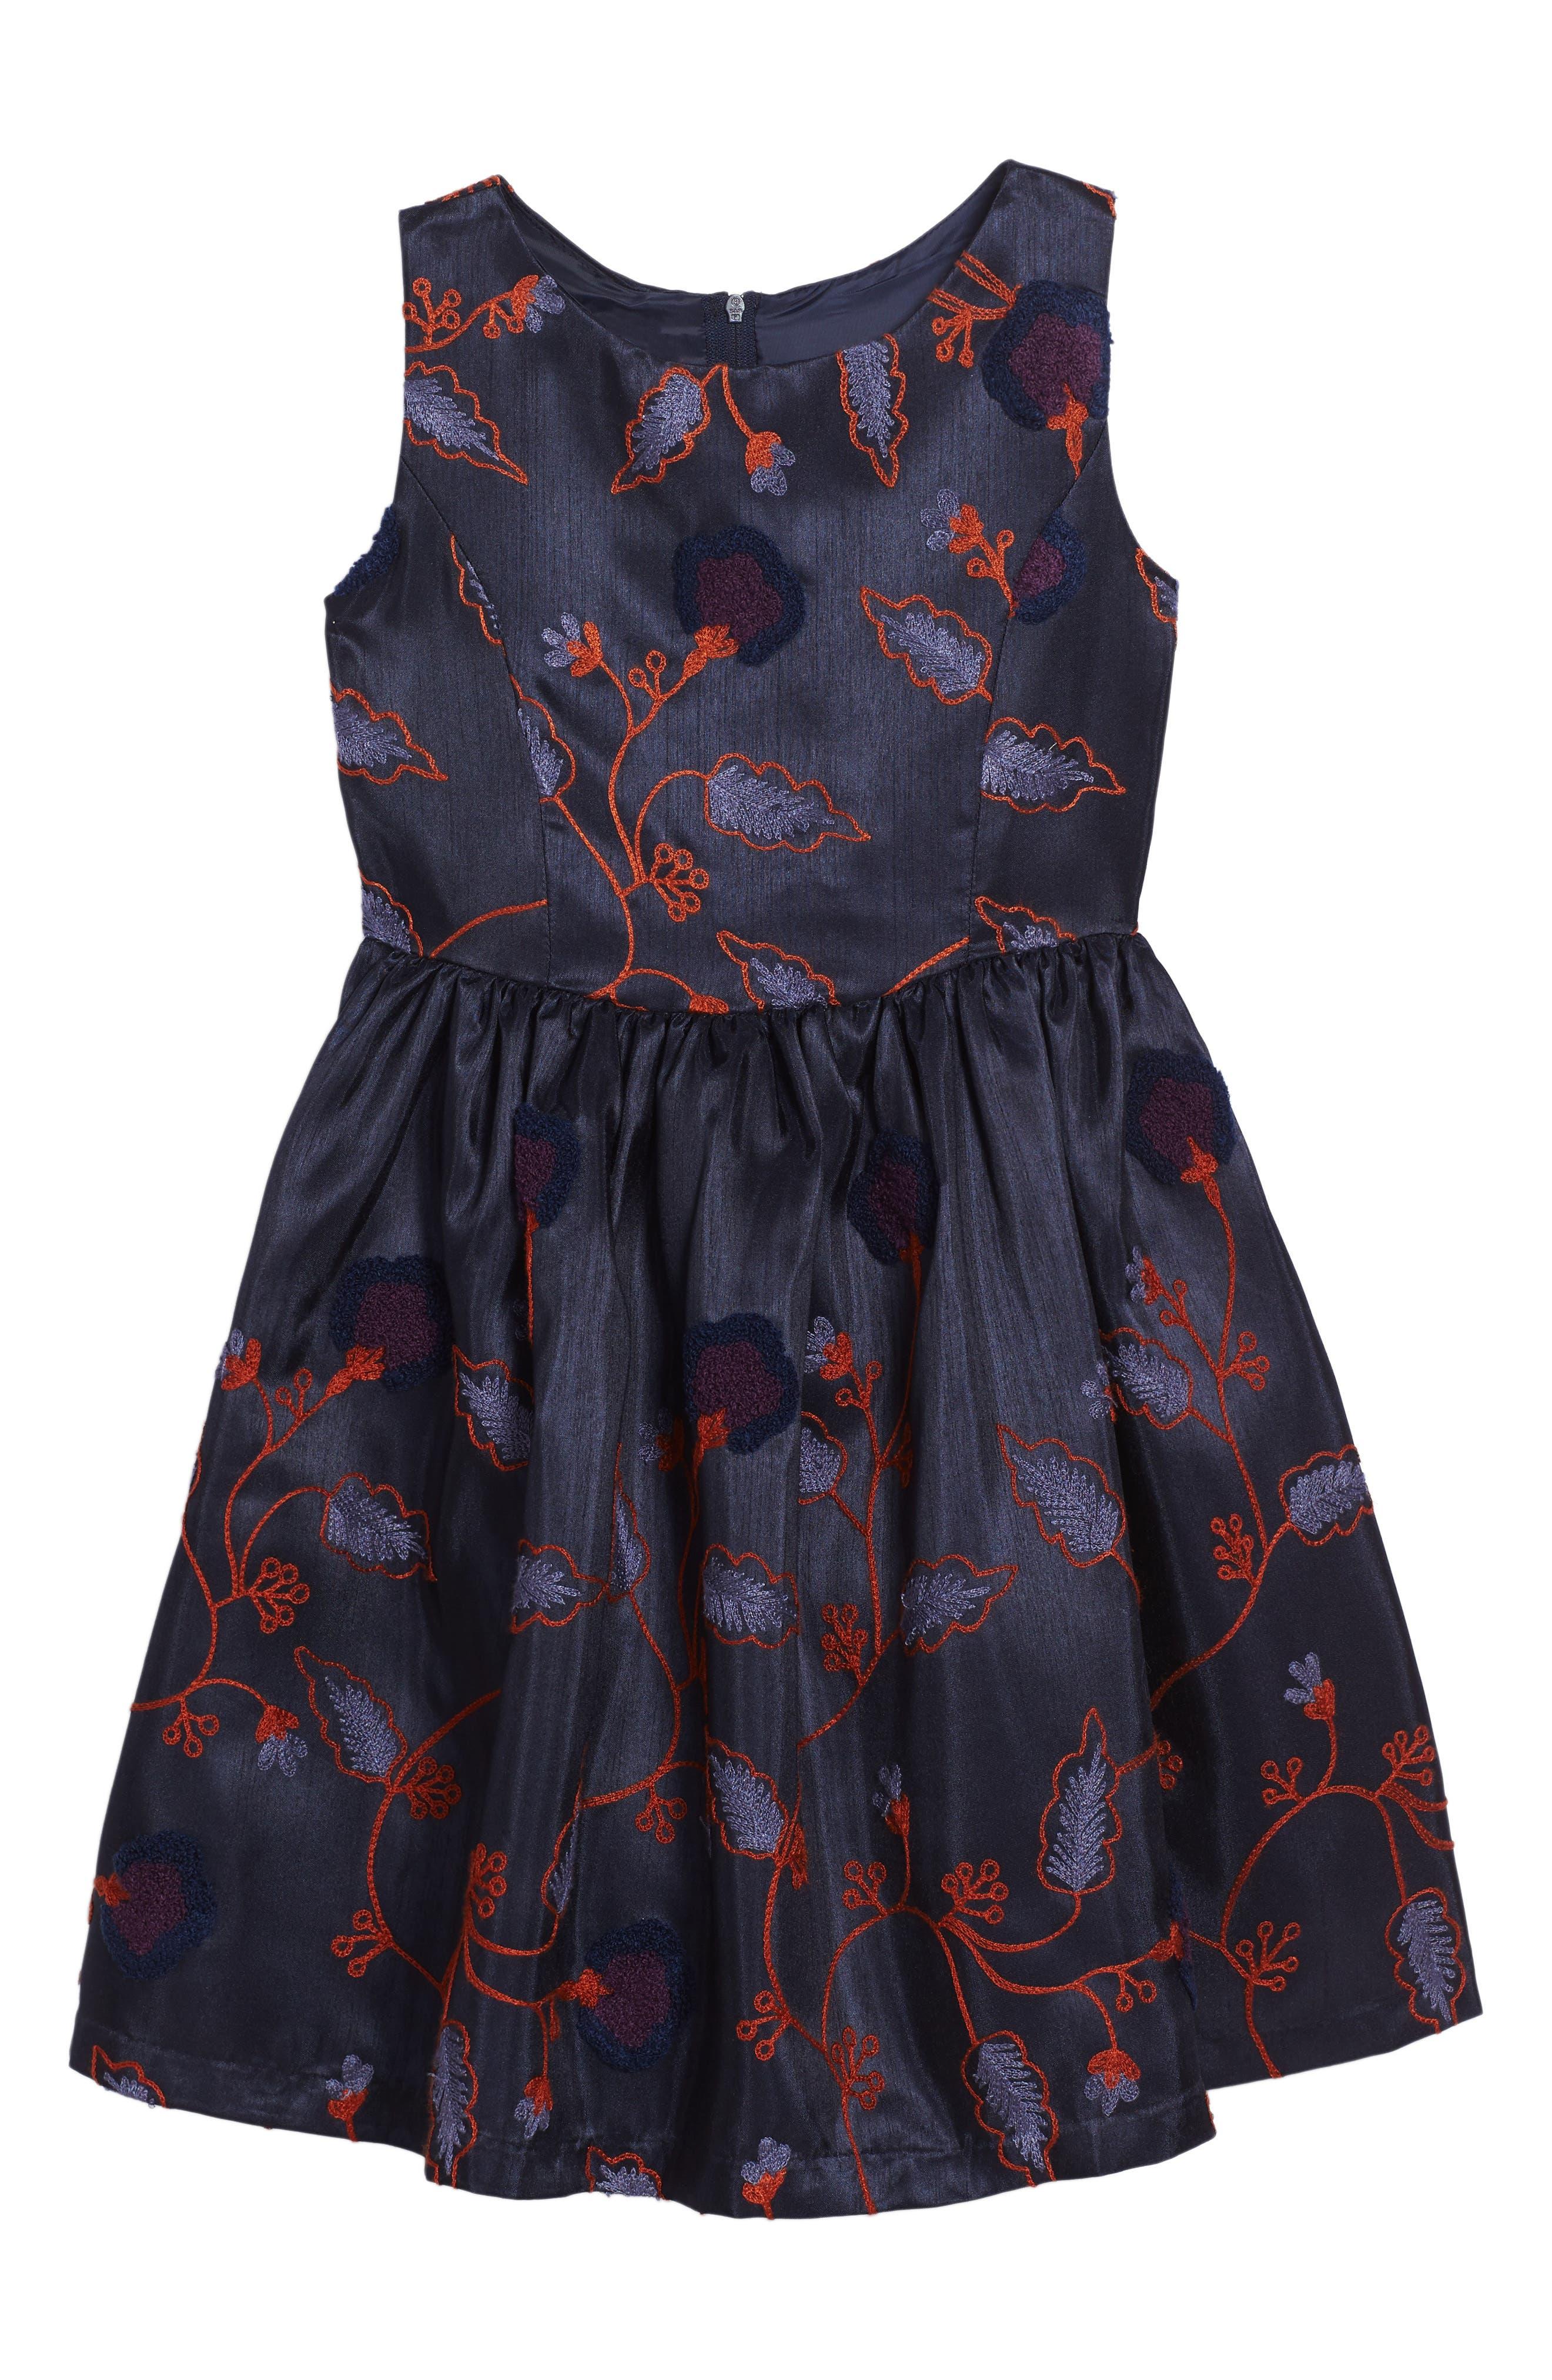 Main Image - Frais Embroidered Floral Dress (Toddler Girls, Little Girls & Big Girls)